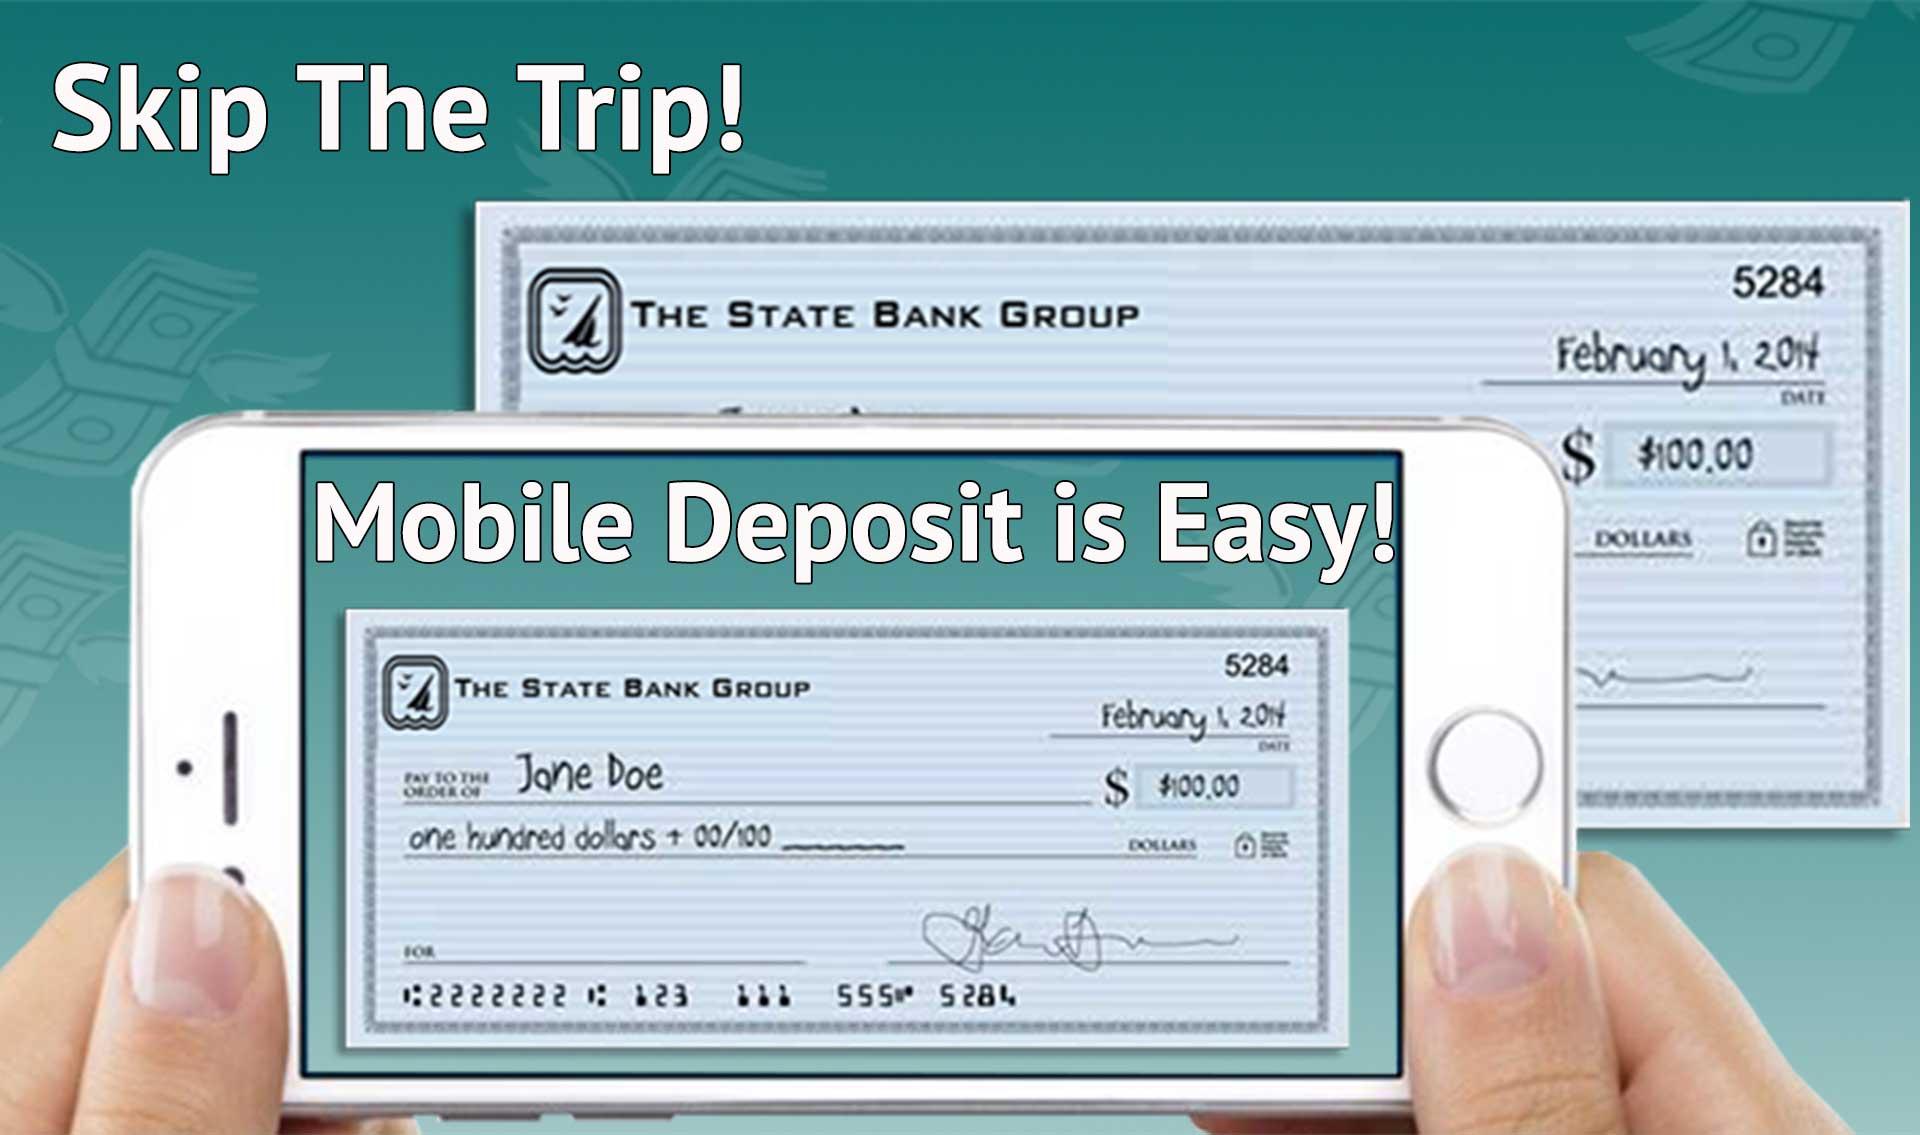 Get mobile deposit